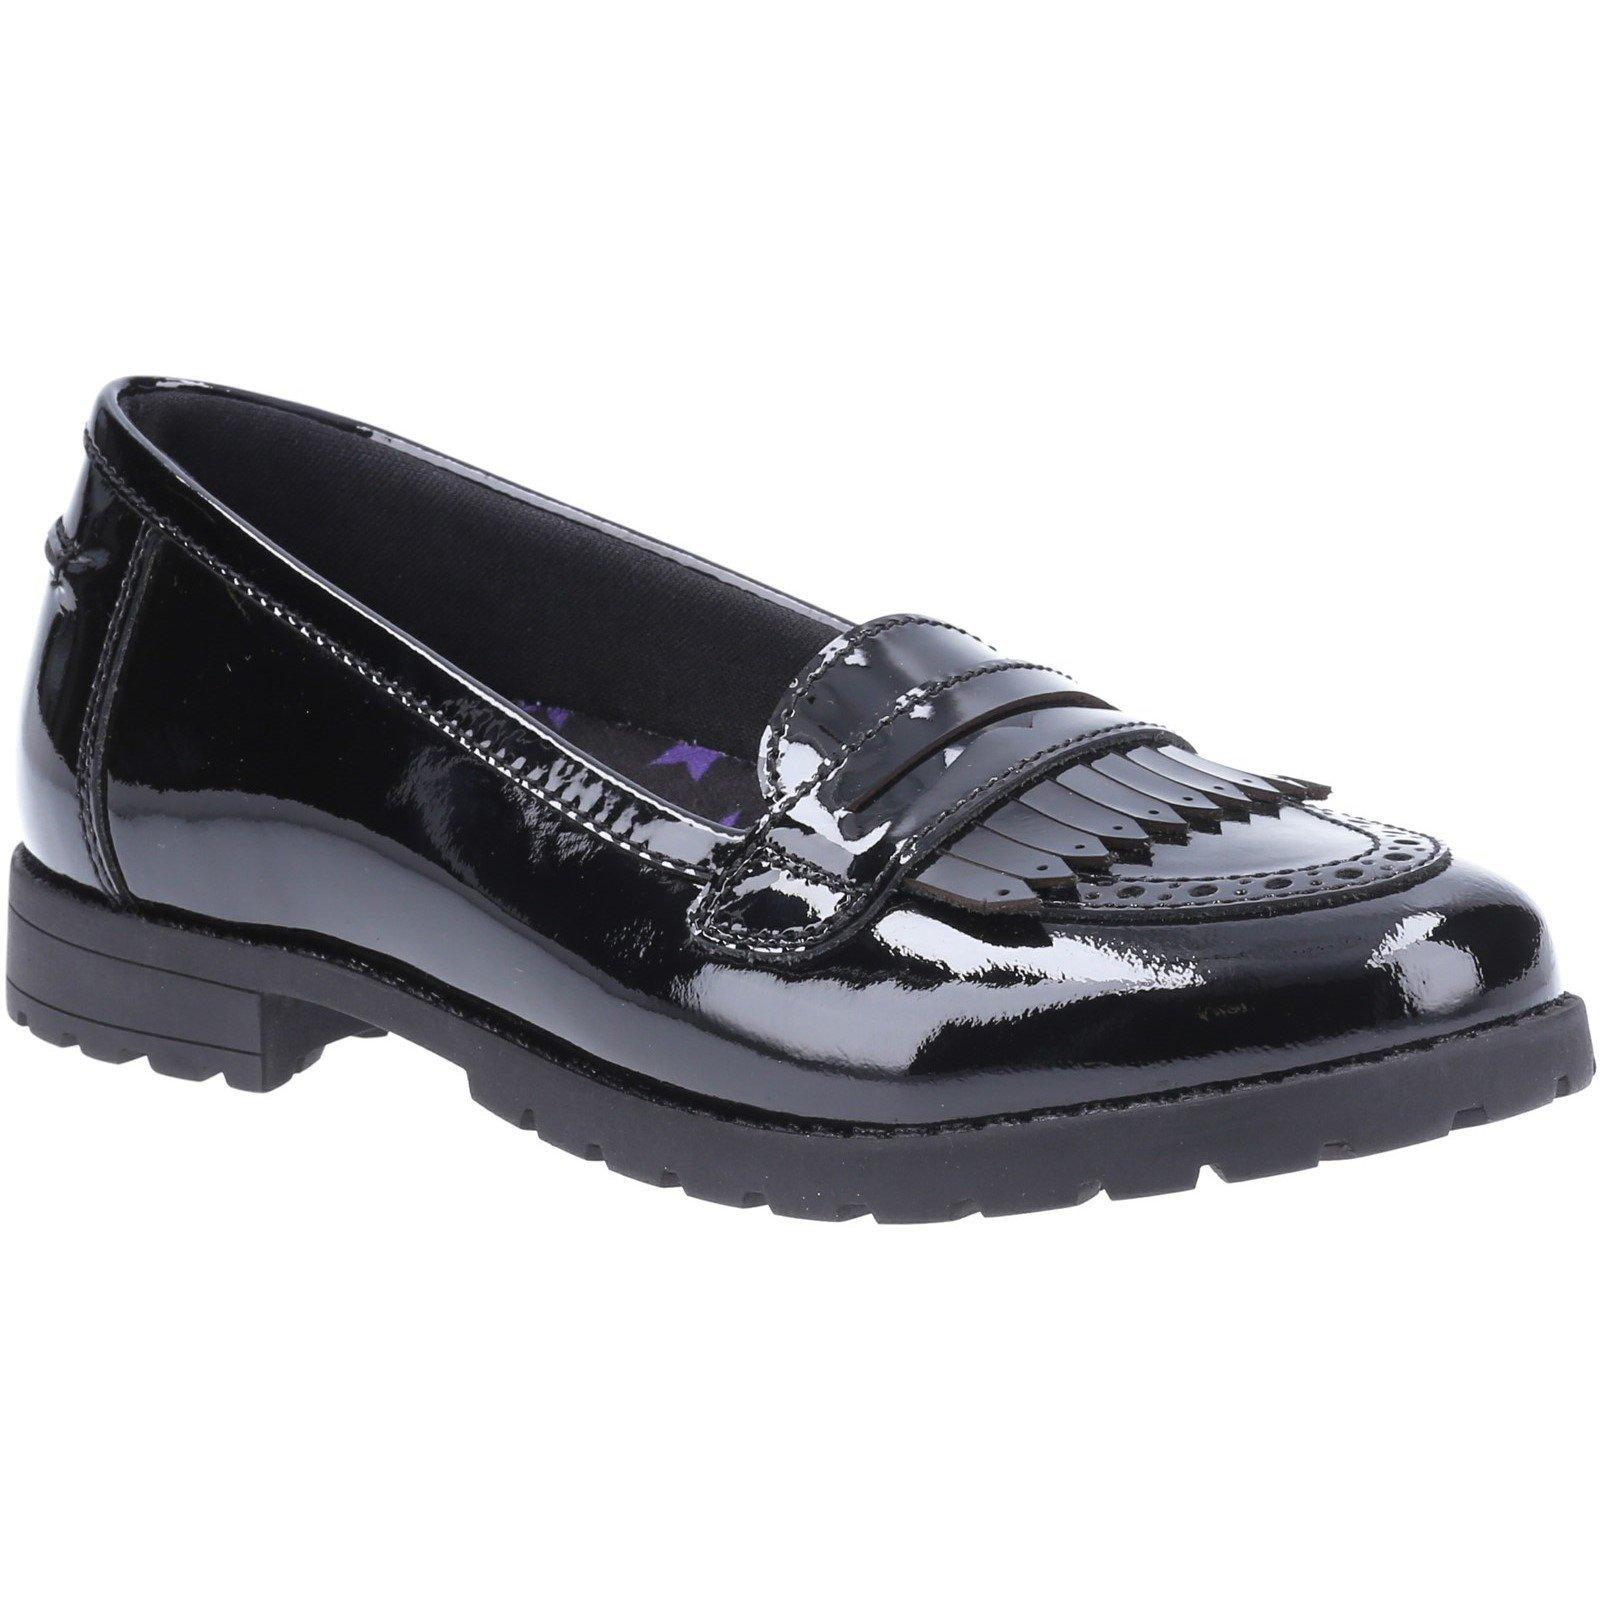 Hush Puppies Kid's Emer Junior School Shoe Patent Black 32595 - Patent Black 11